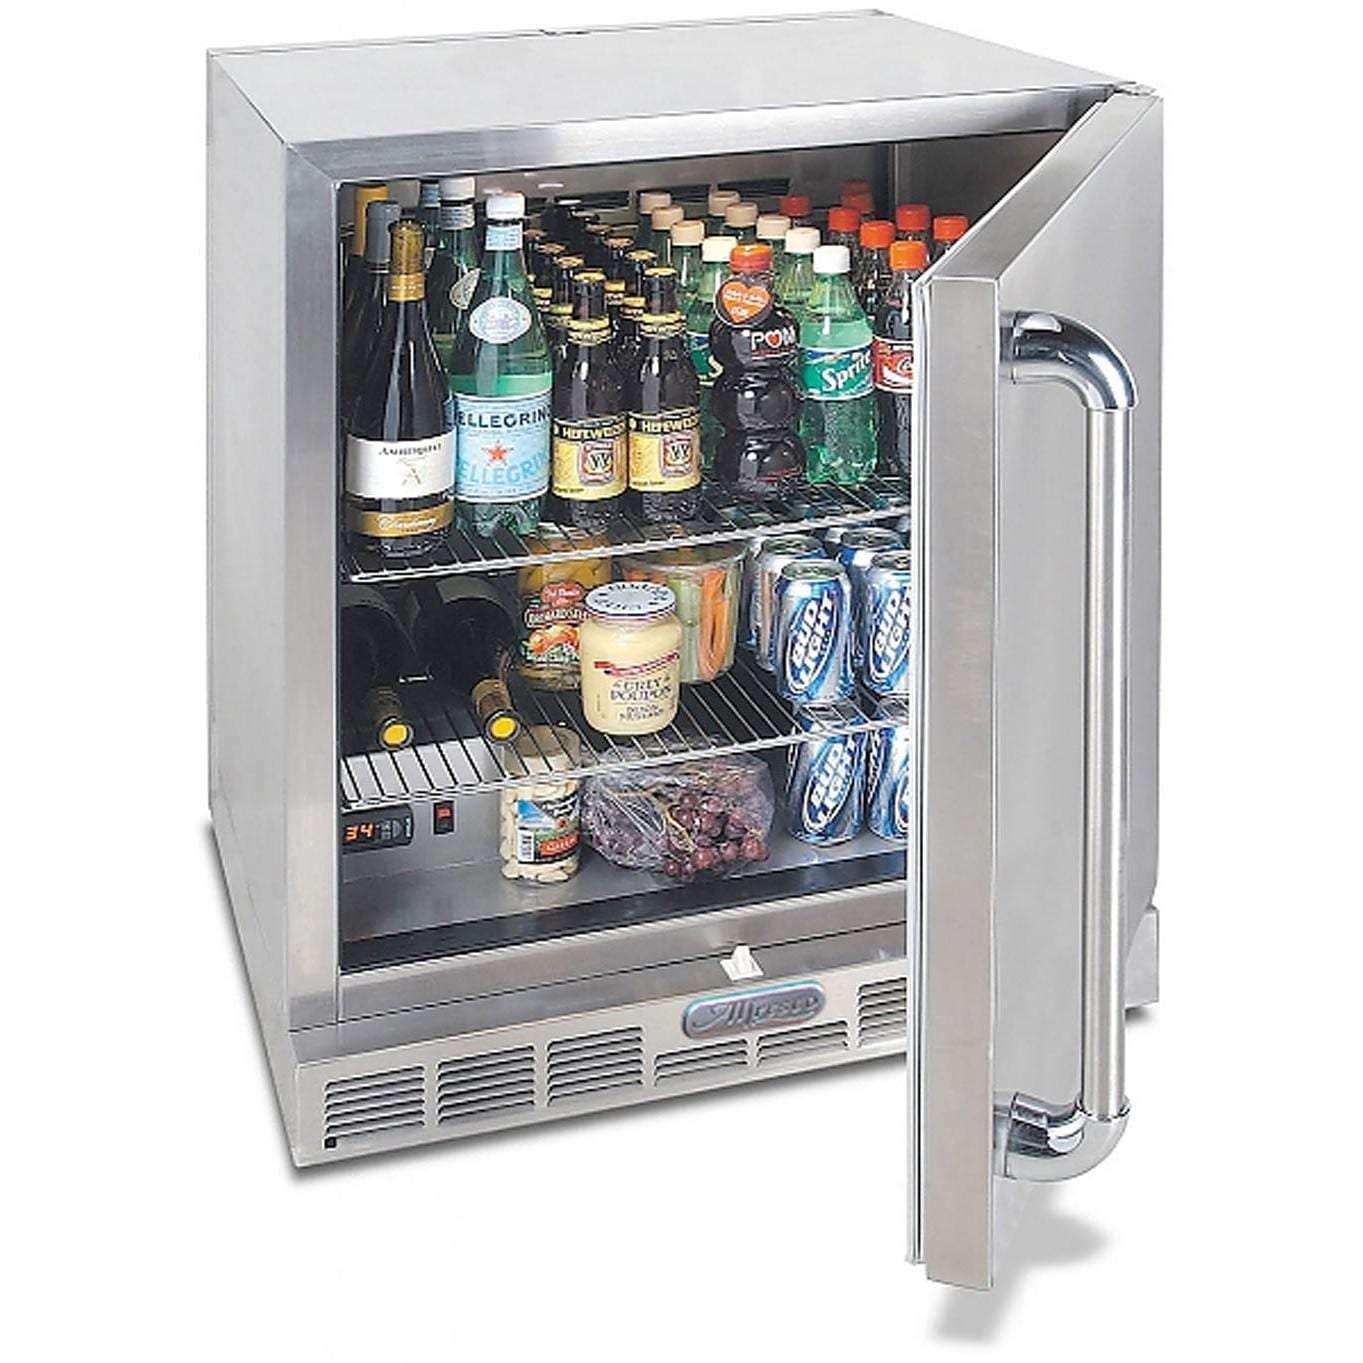 Alfresco 28-Inch Outdoor Compact Refrigerator